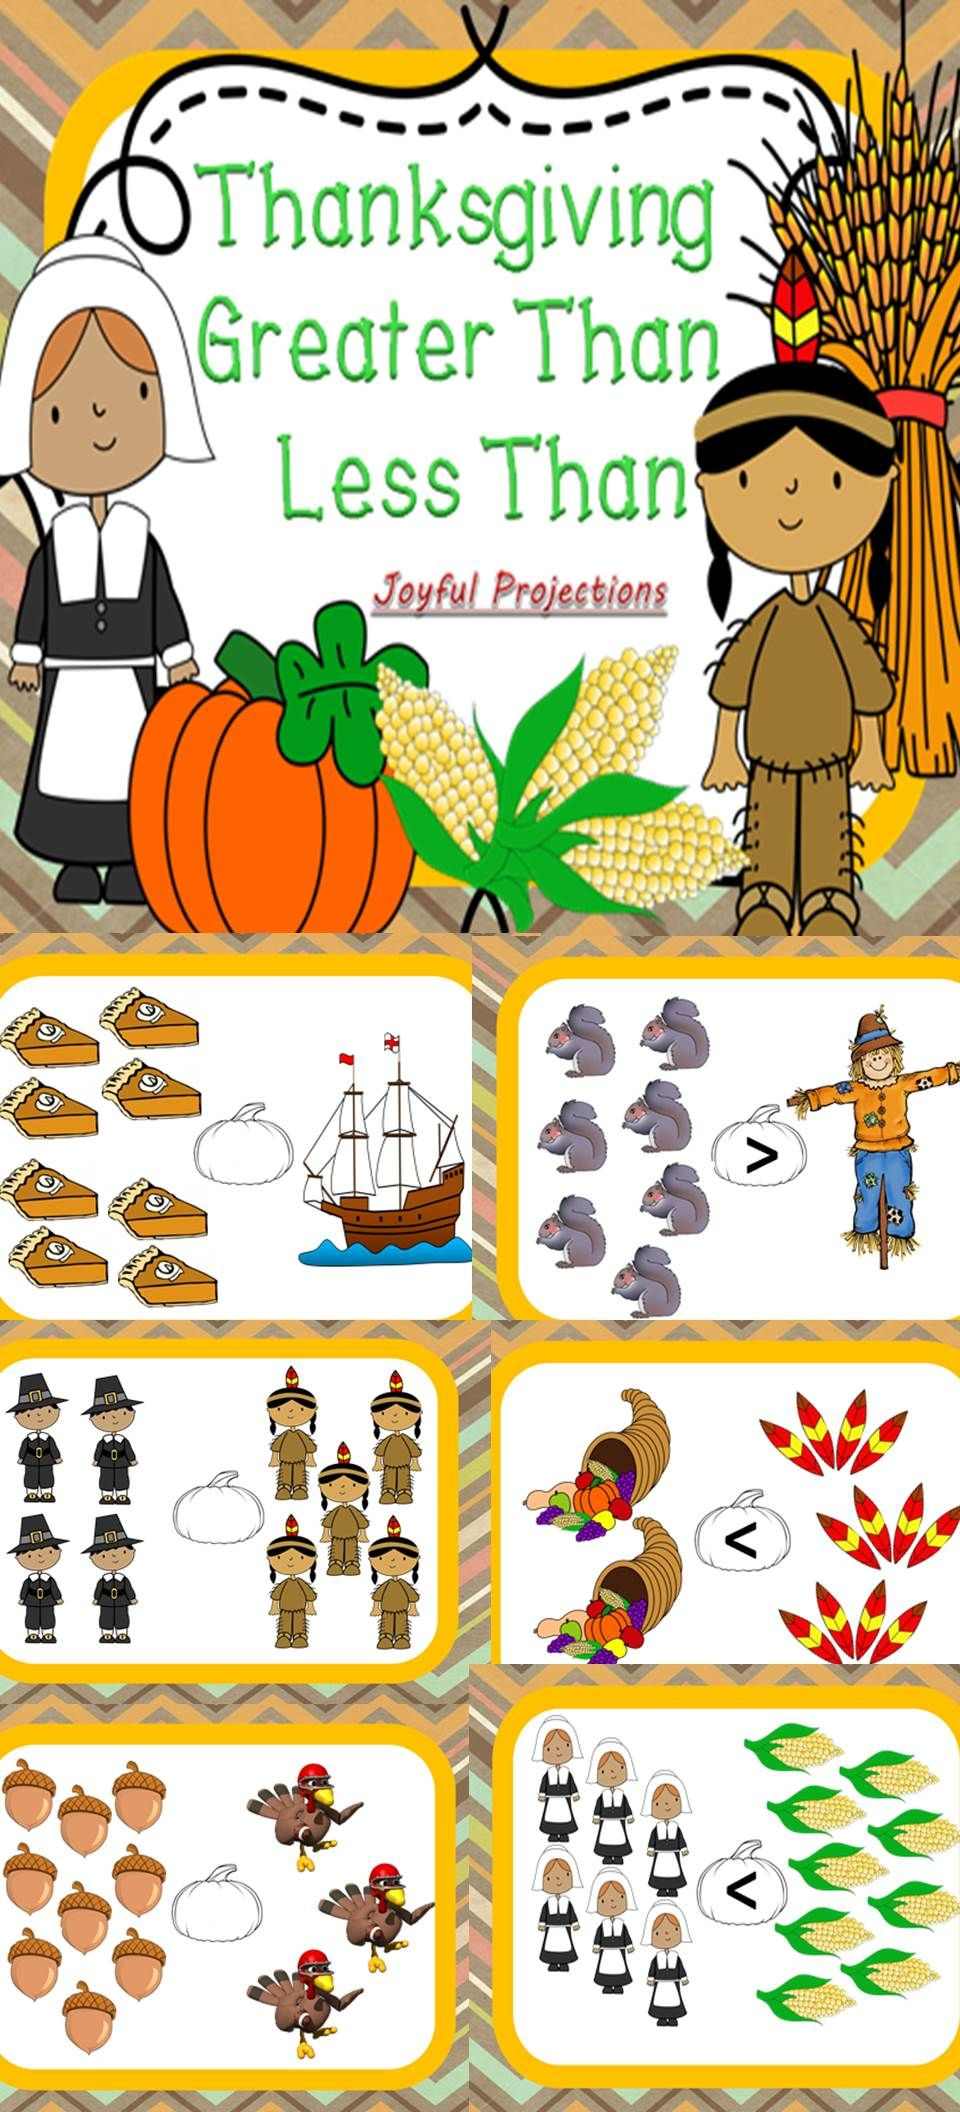 Thanksgiving math greater than less than smartboard fun thanksgiving math greater than less than smartboard fun buycottarizona